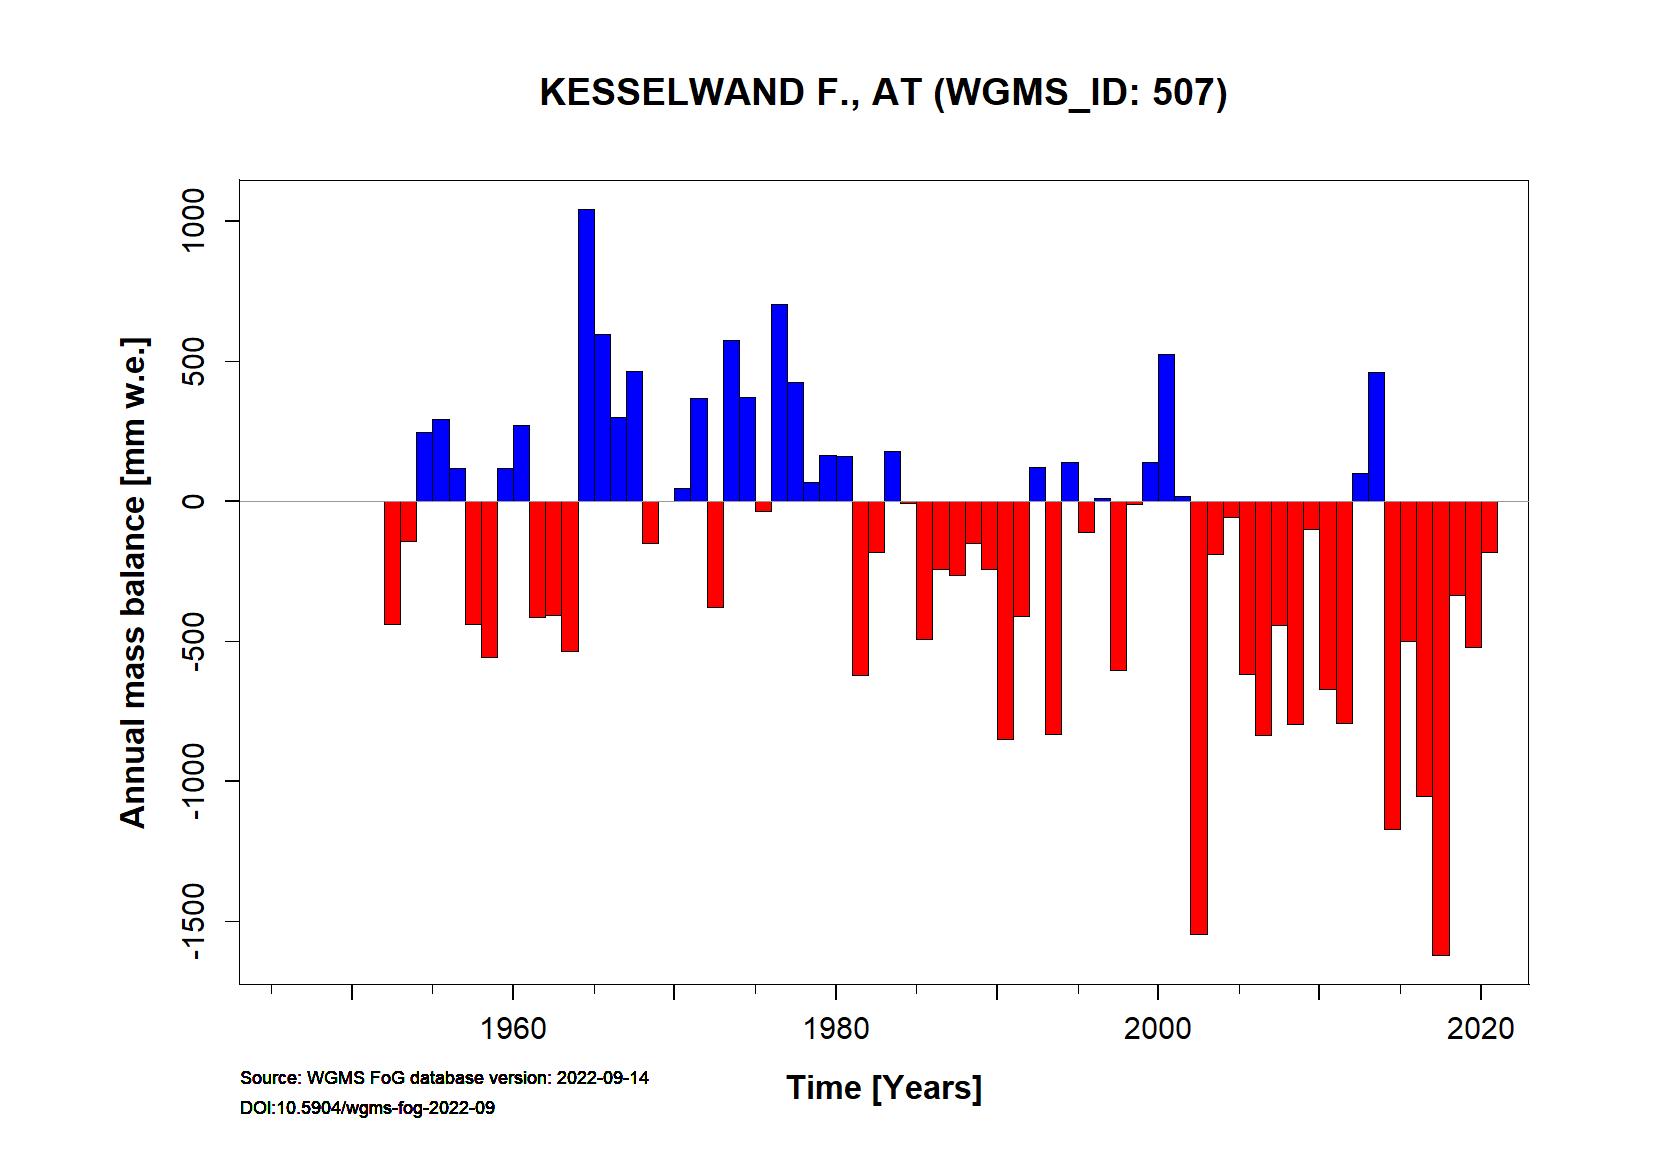 Kesselwandferner Annual Mass Balance (WGMS, 2016)